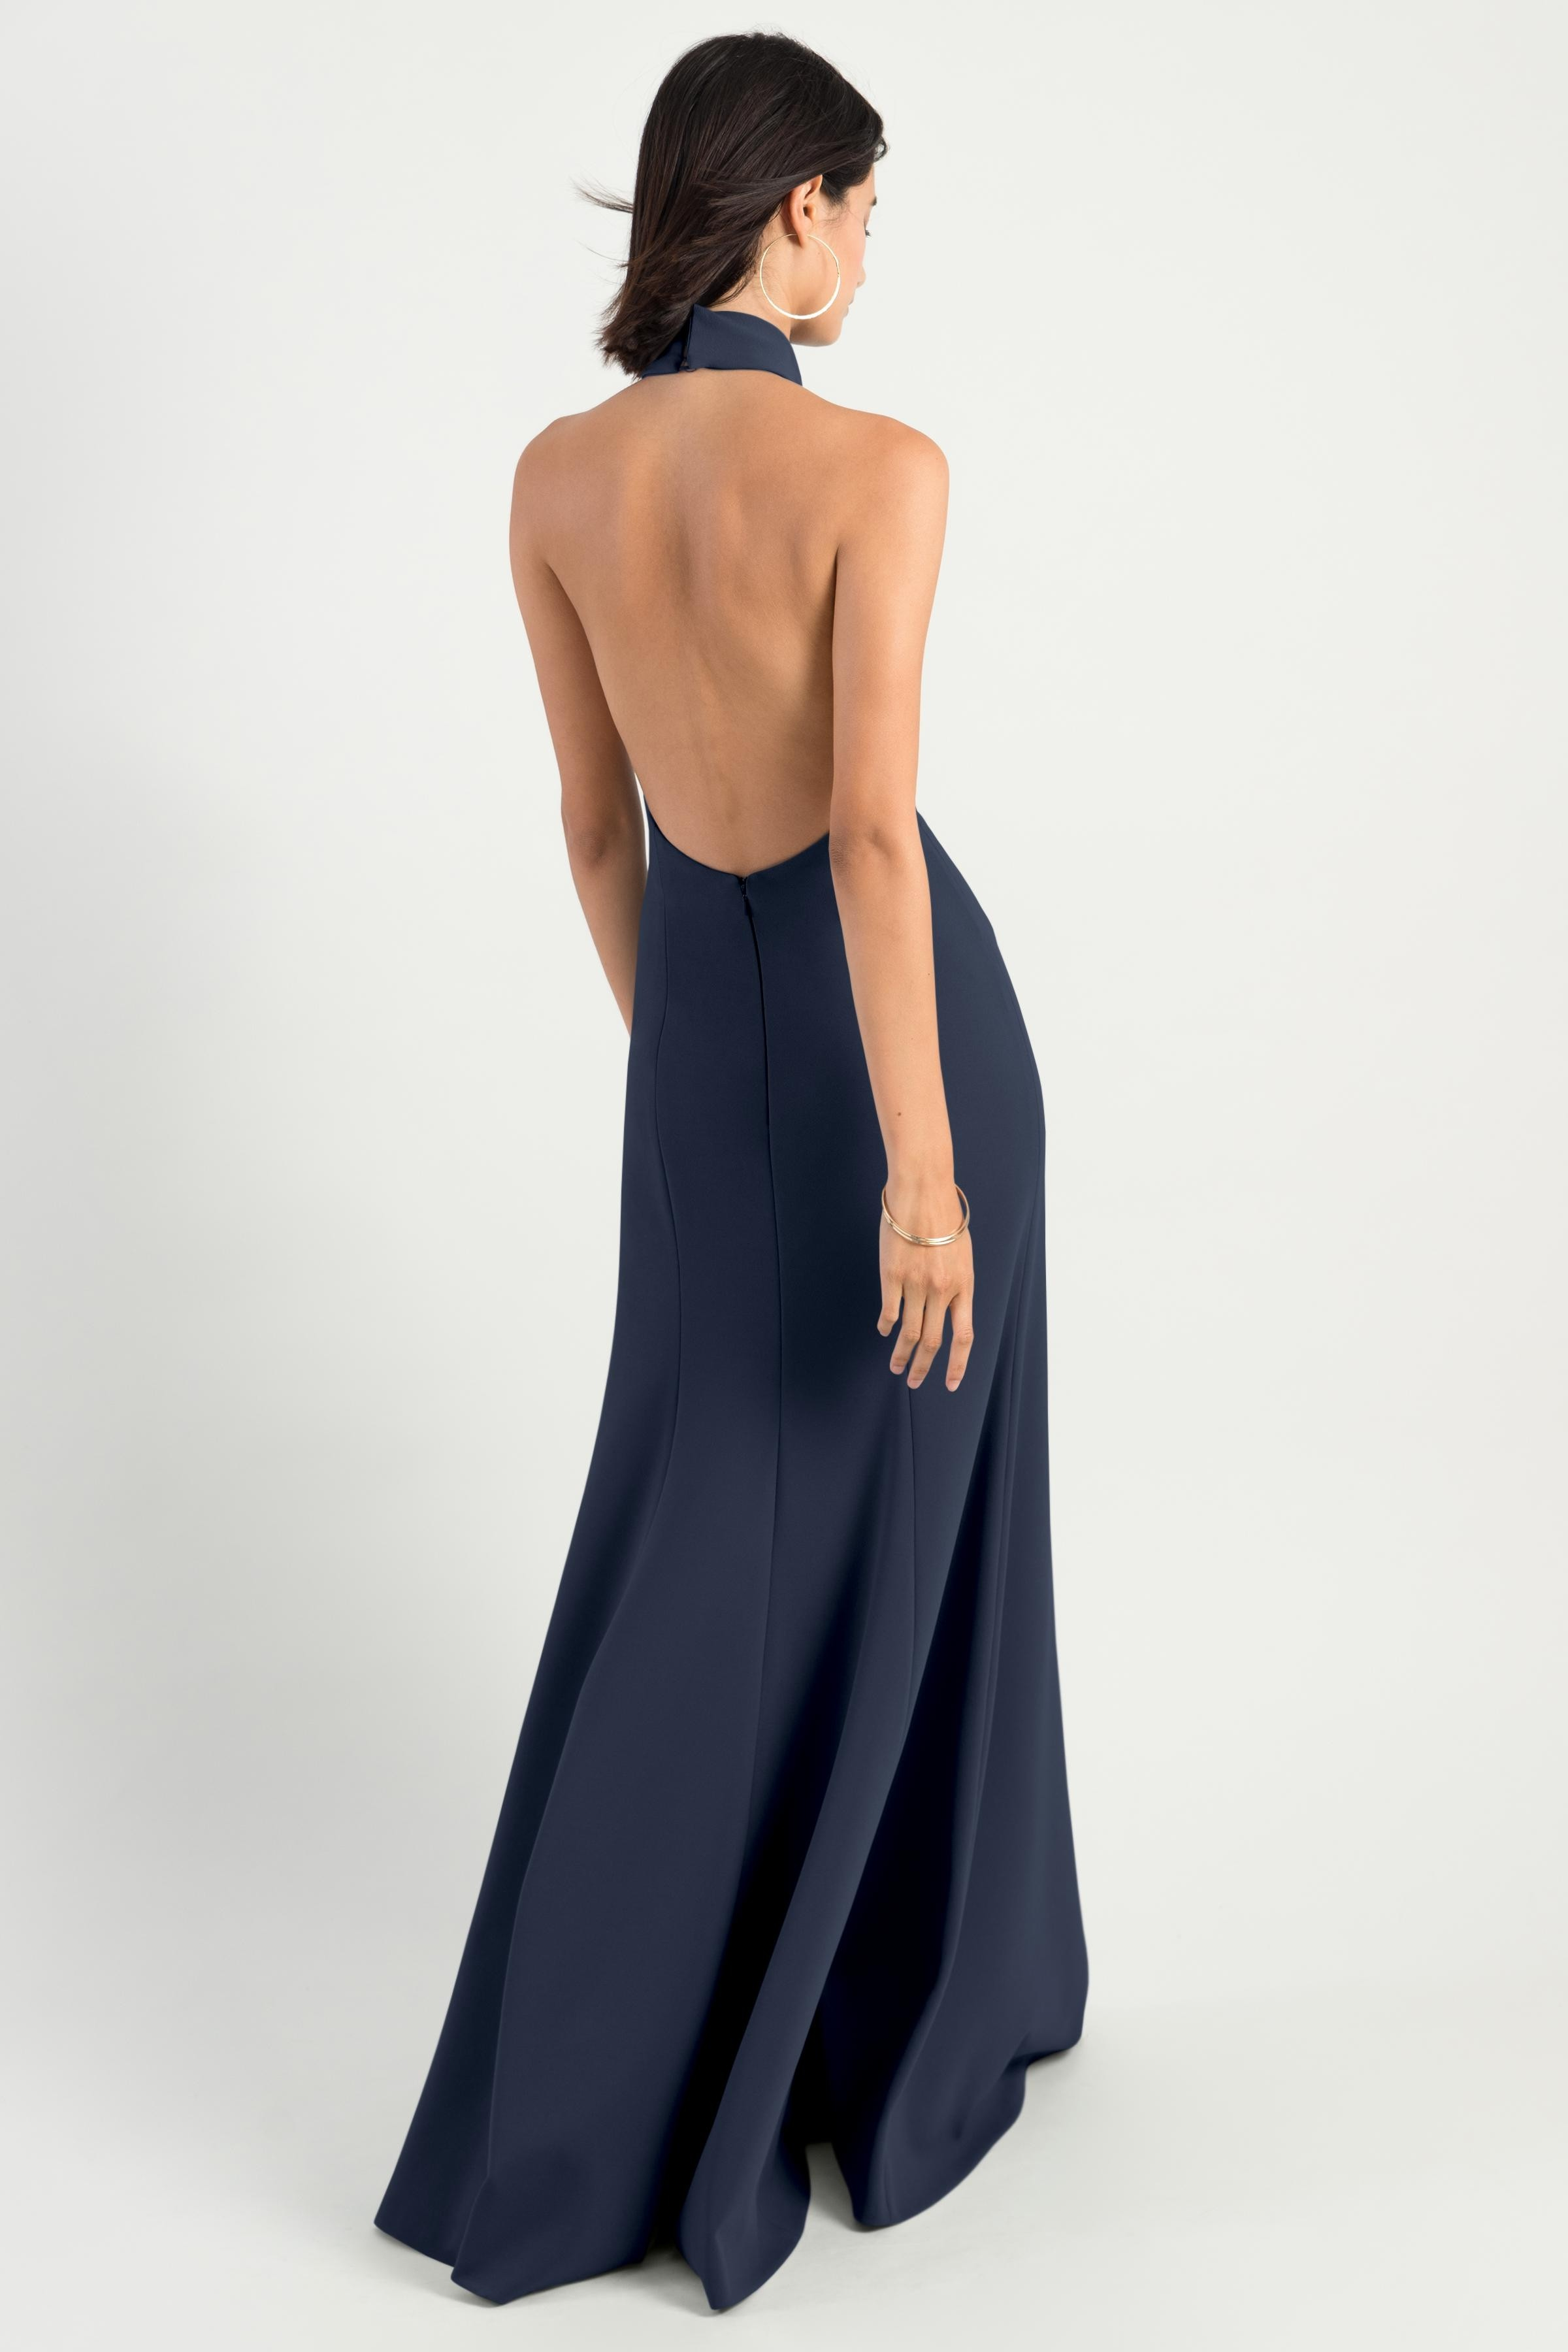 Petra Bridesmaids Dress by Jenny Yoo - Midnight